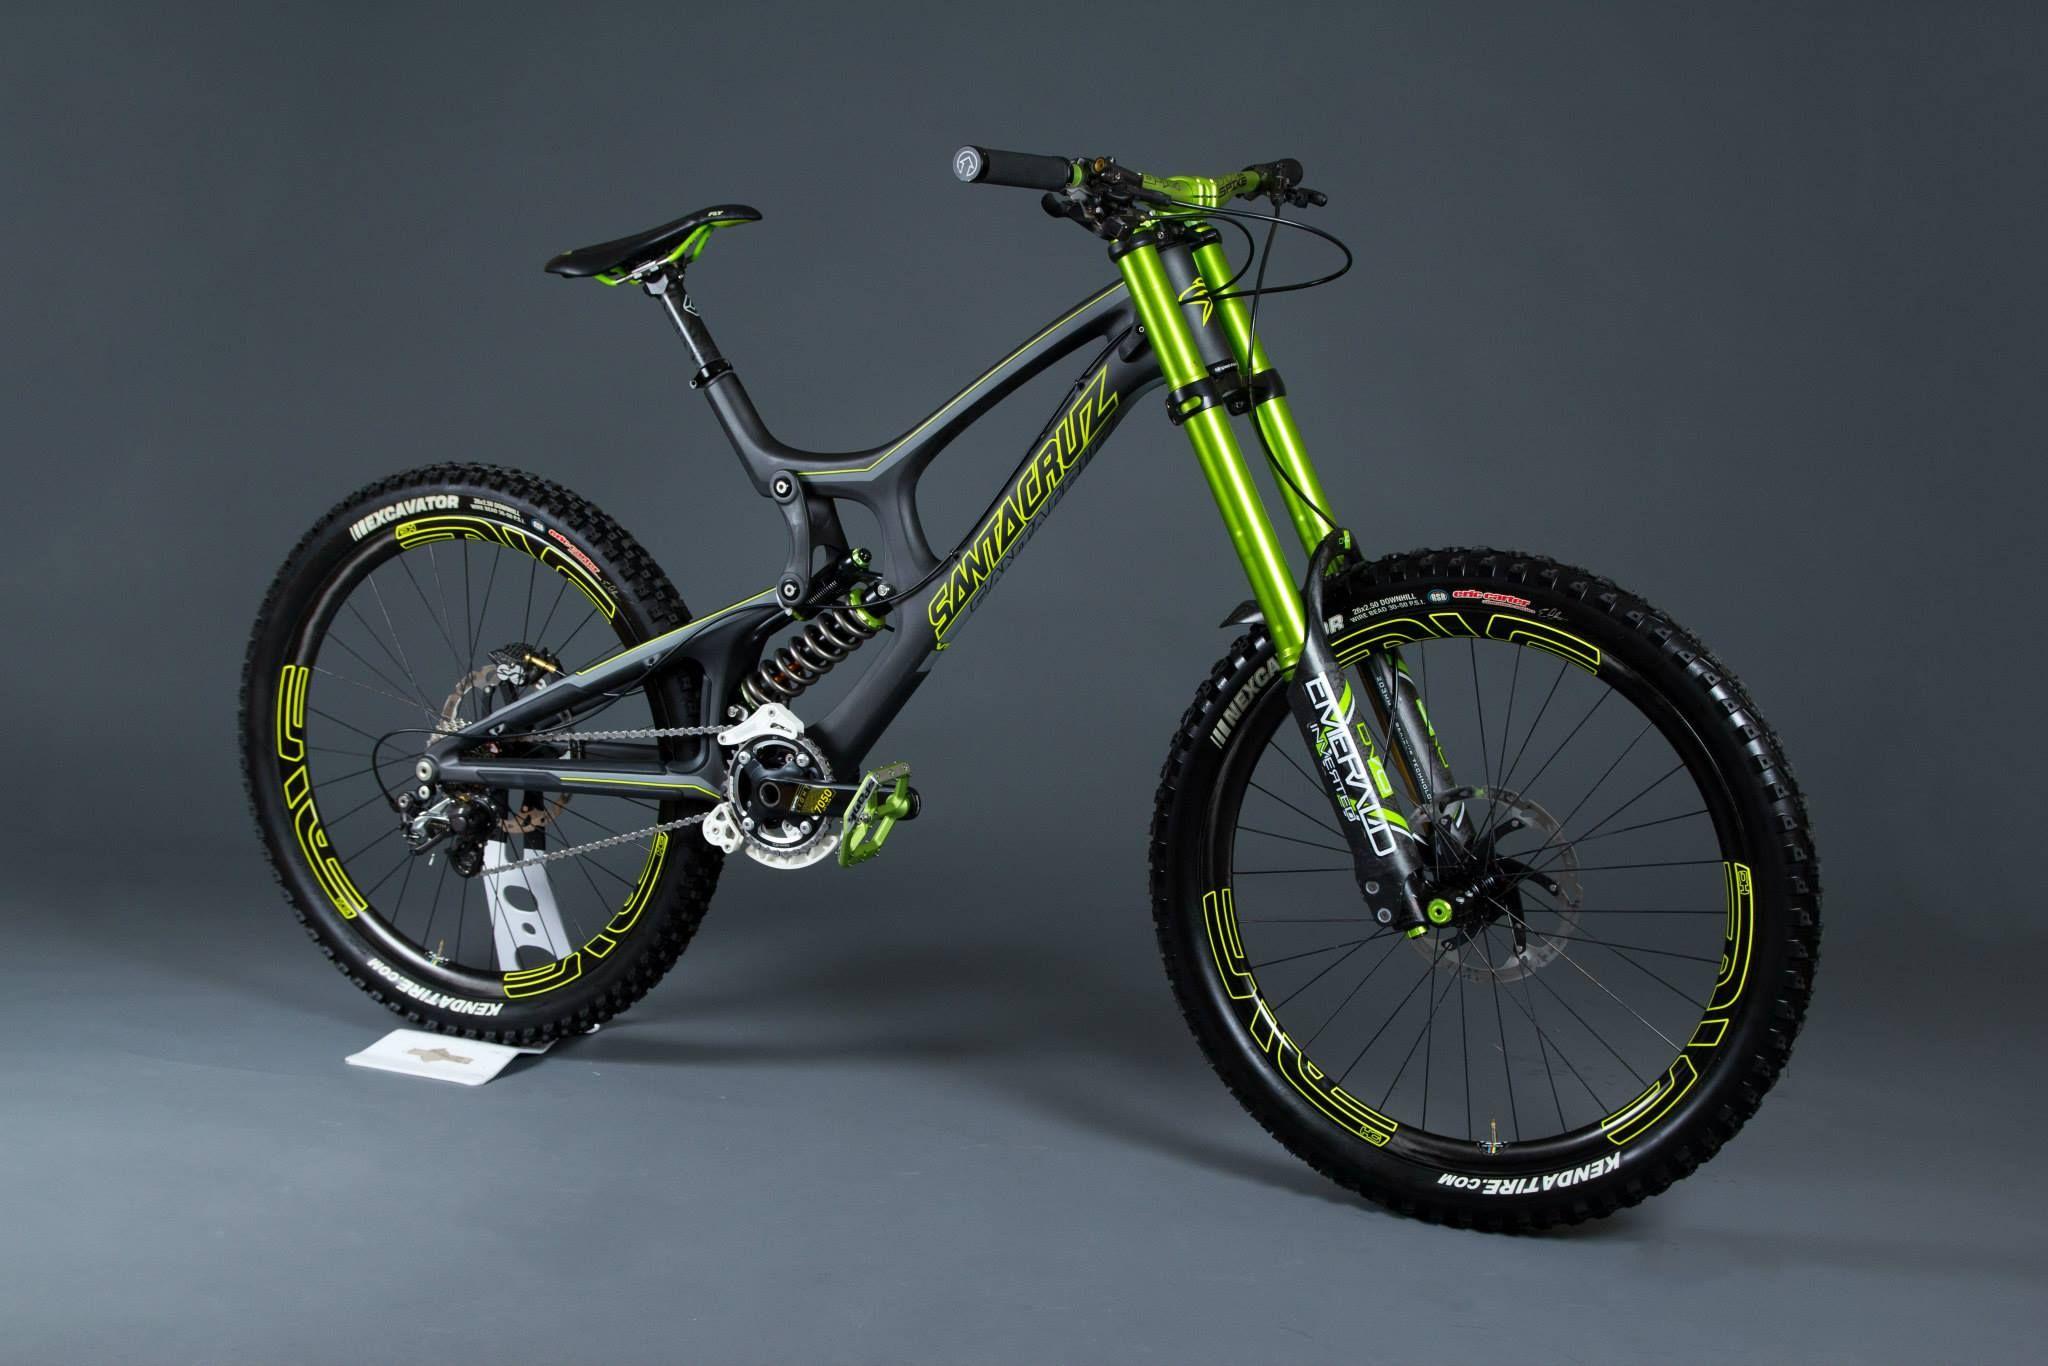 Downhill bike santa cruz v10 carbon speacial 8286 yo prefiero downhill bike santa cruz v10 carbon speacial 8286 thecheapjerseys Gallery